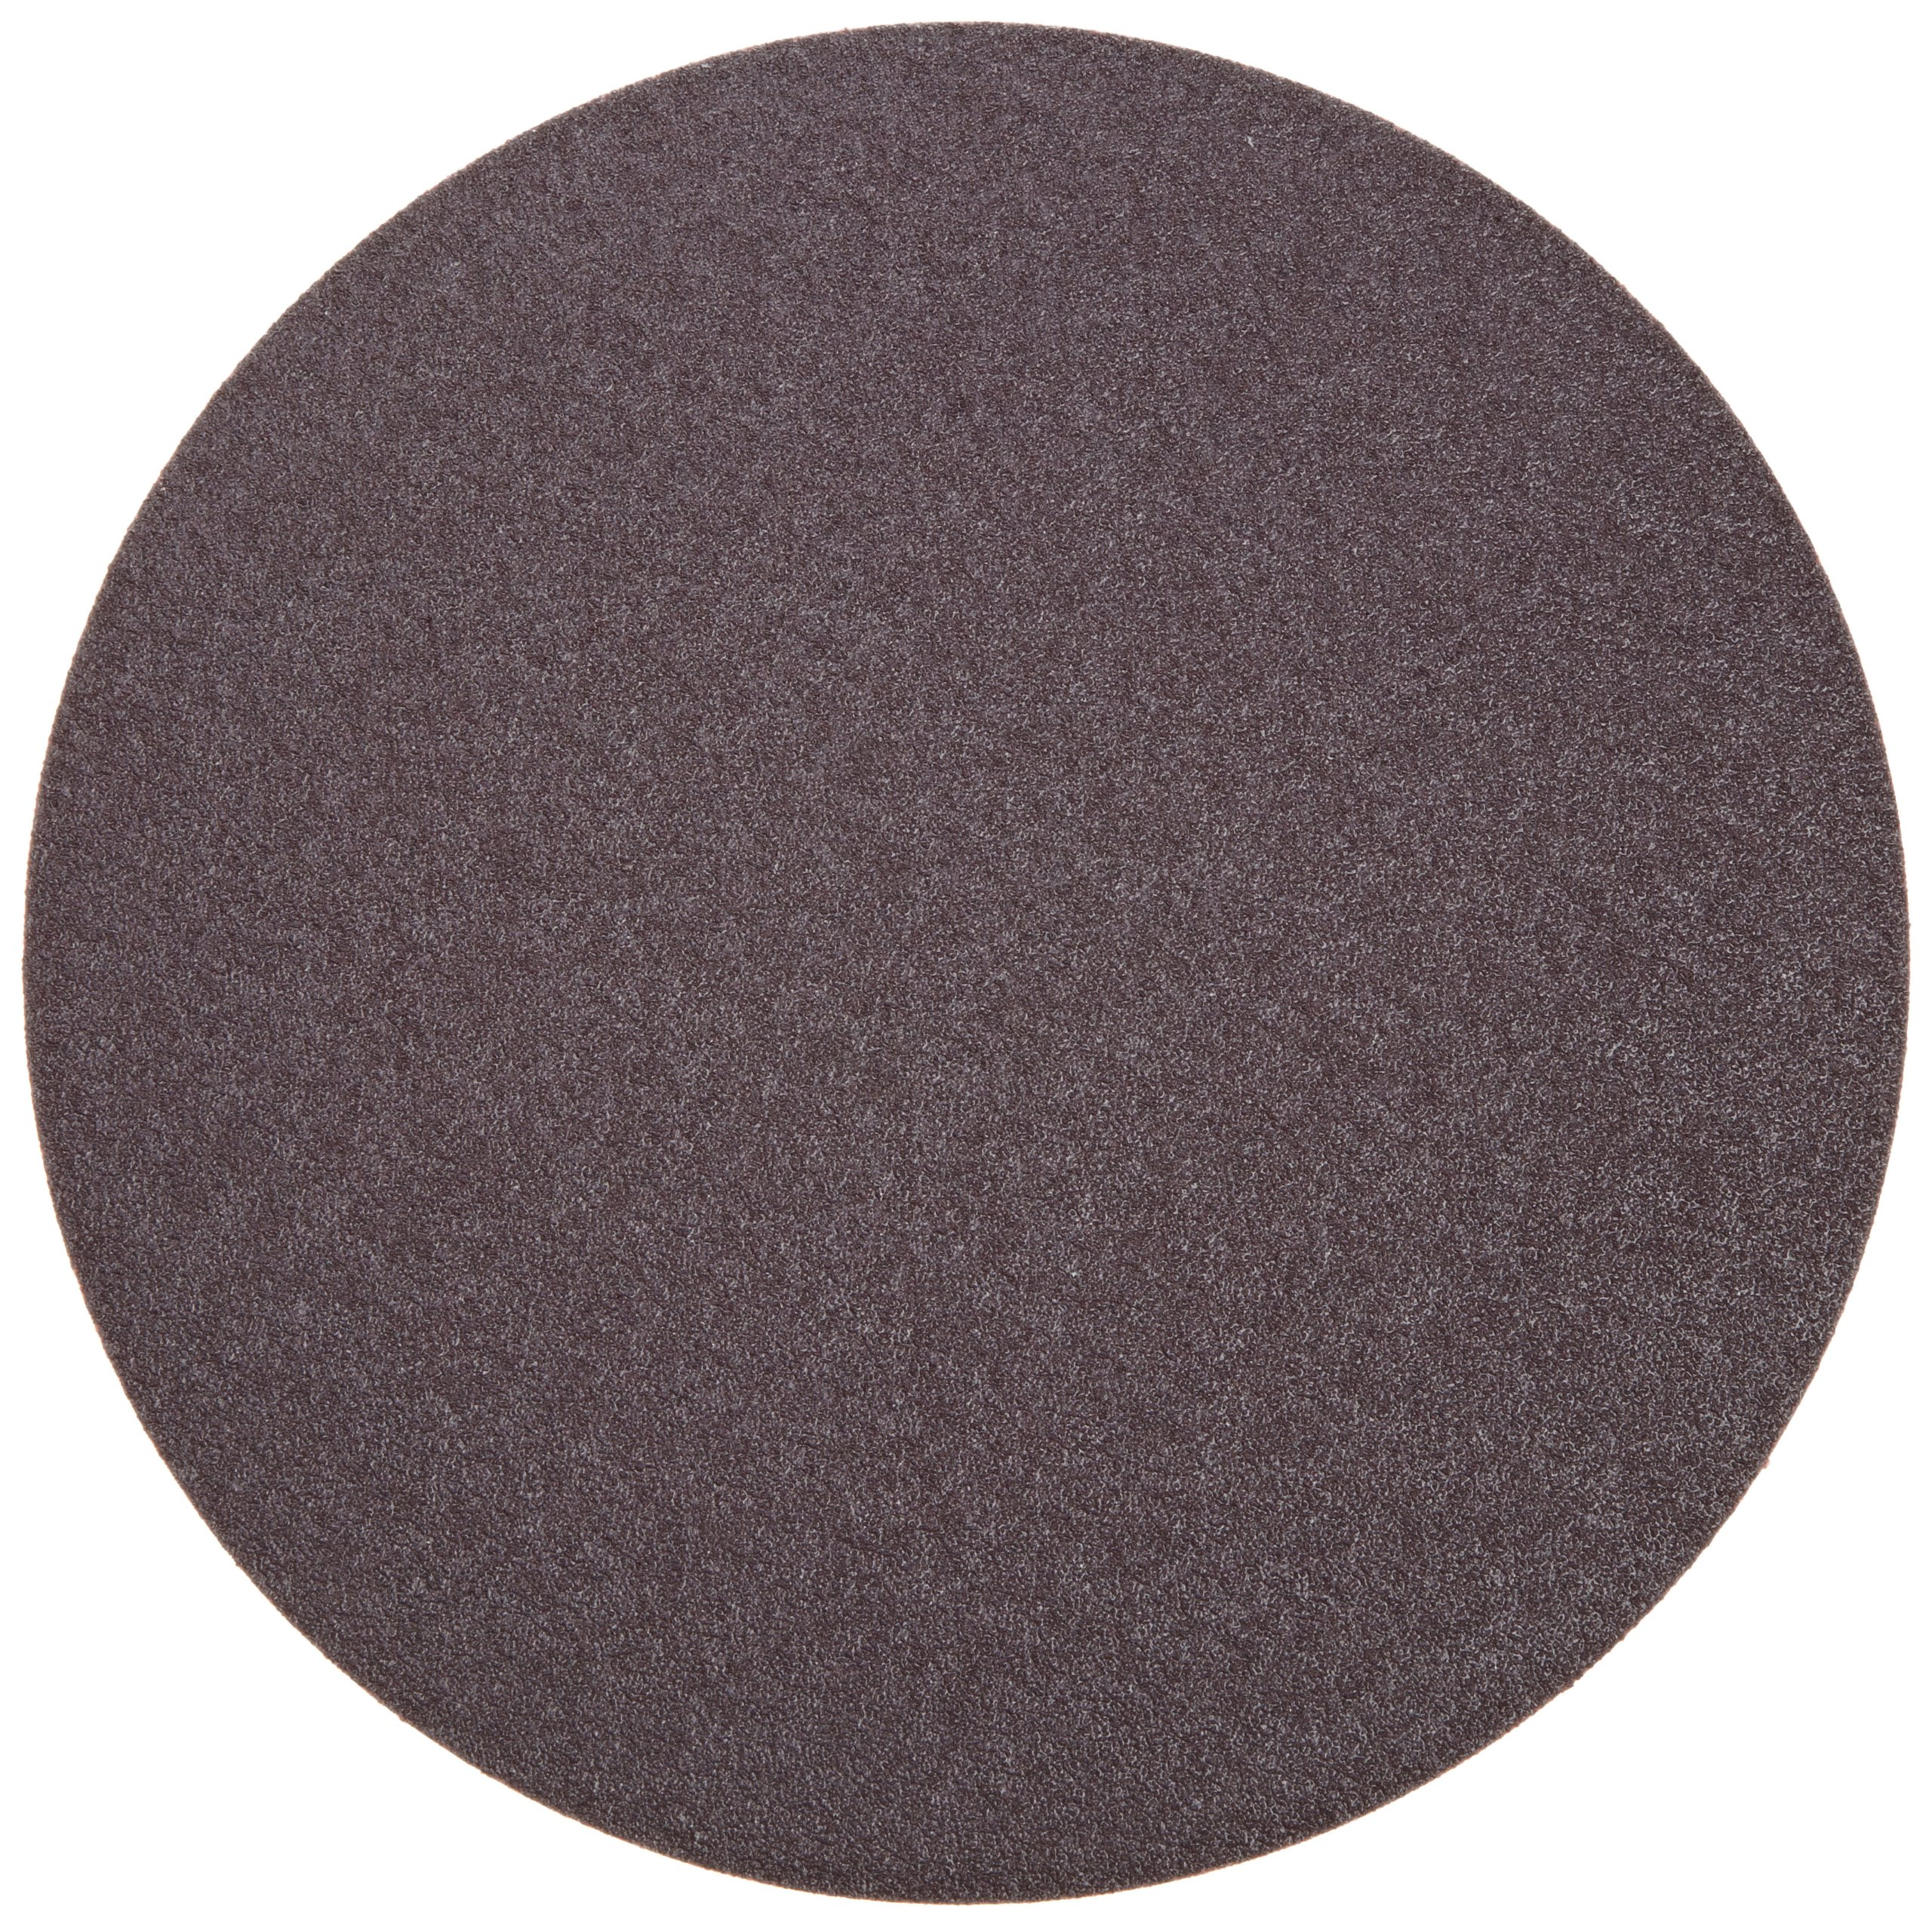 Norton Metalite R228 PSA Disc, Cotton Backing, Pressure Sensitive Adhesive, Aluminum Oxide, 10'' Diameter, Grit 80 (Pack of 5)